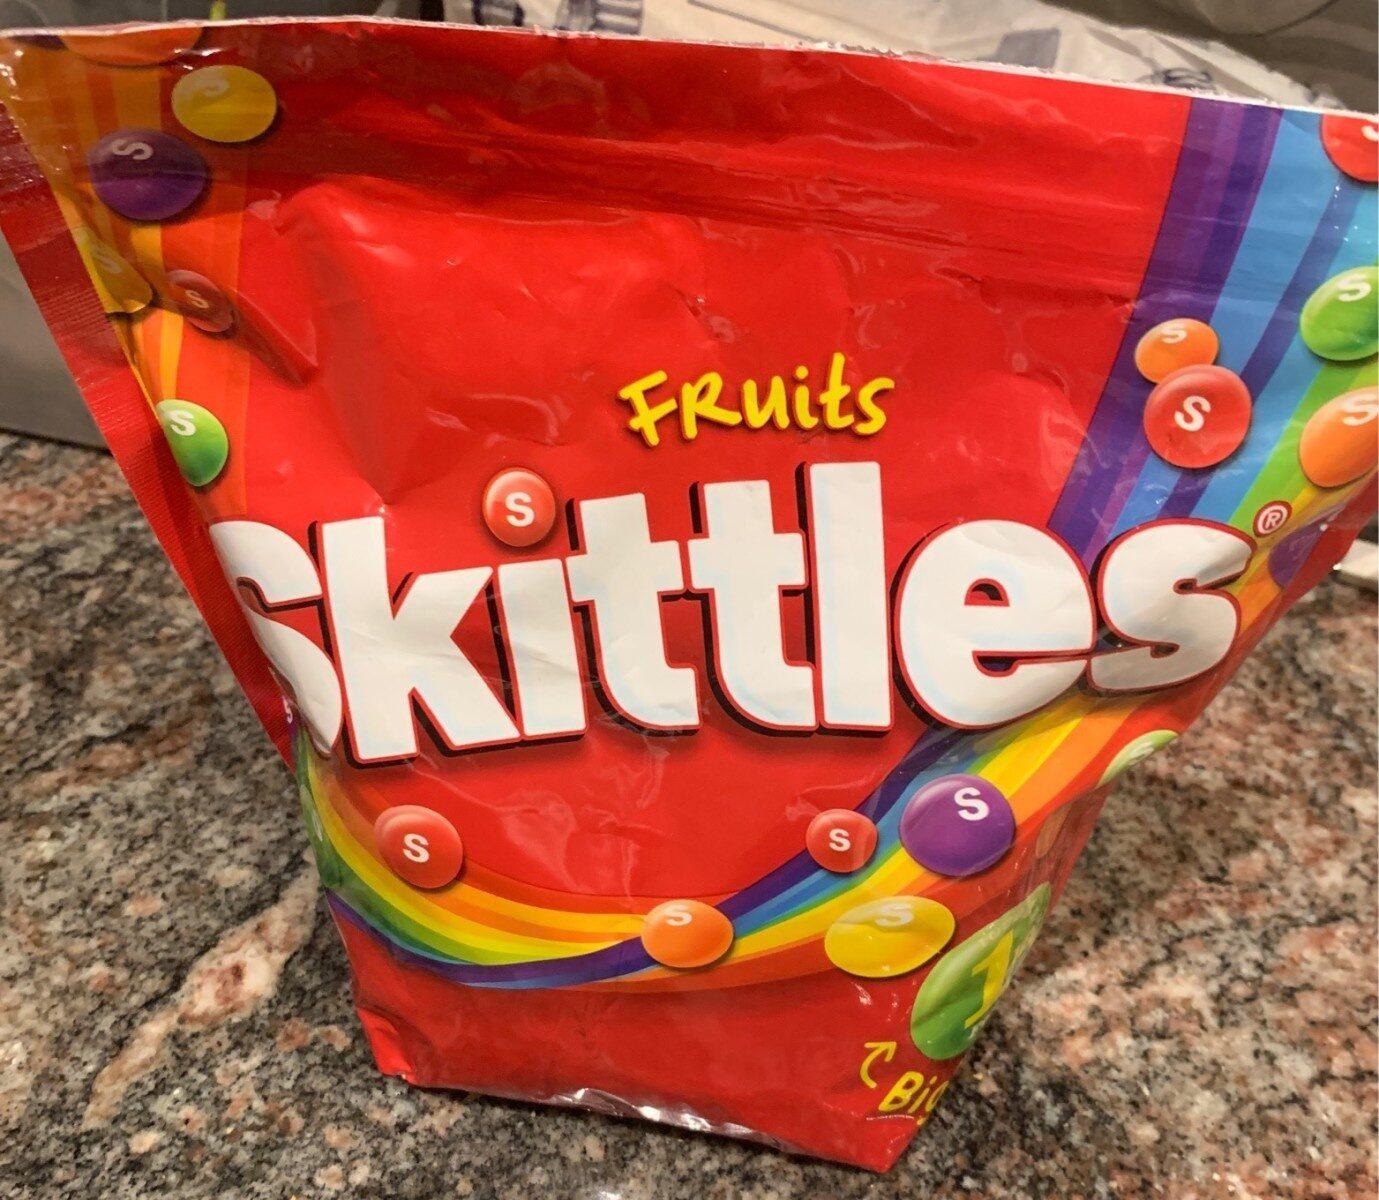 Skittles - Product